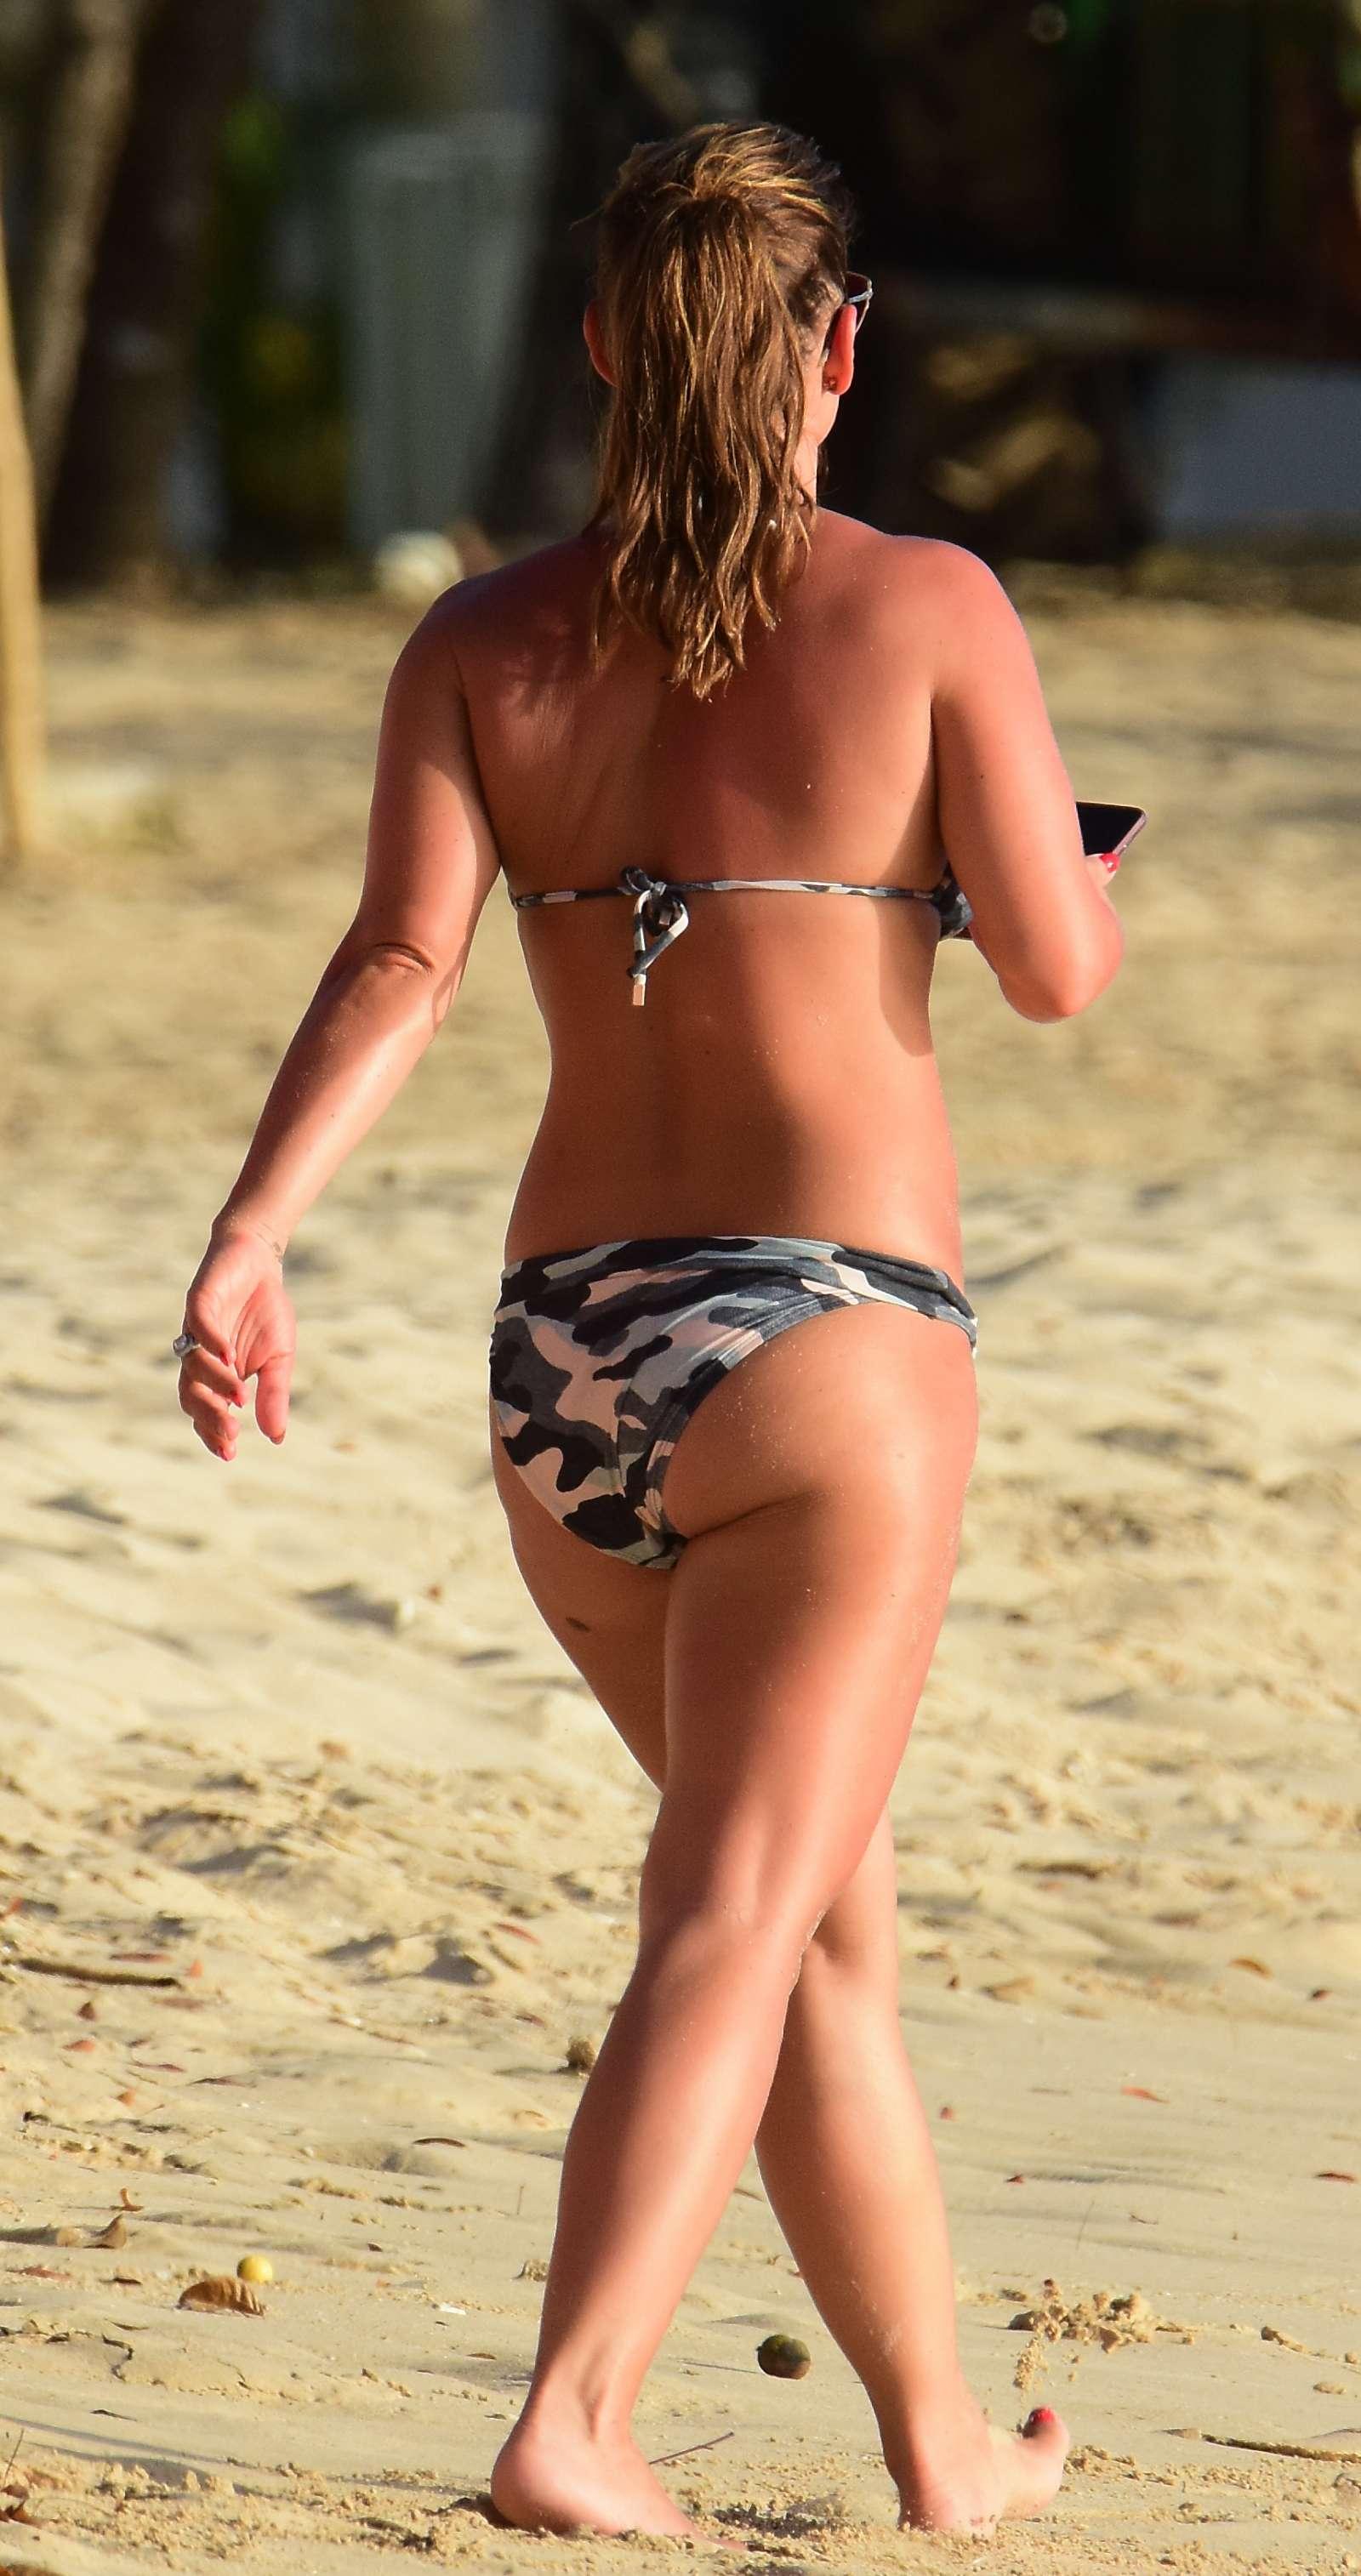 Coleen Rooney In Bikini 2017 20 Gotceleb